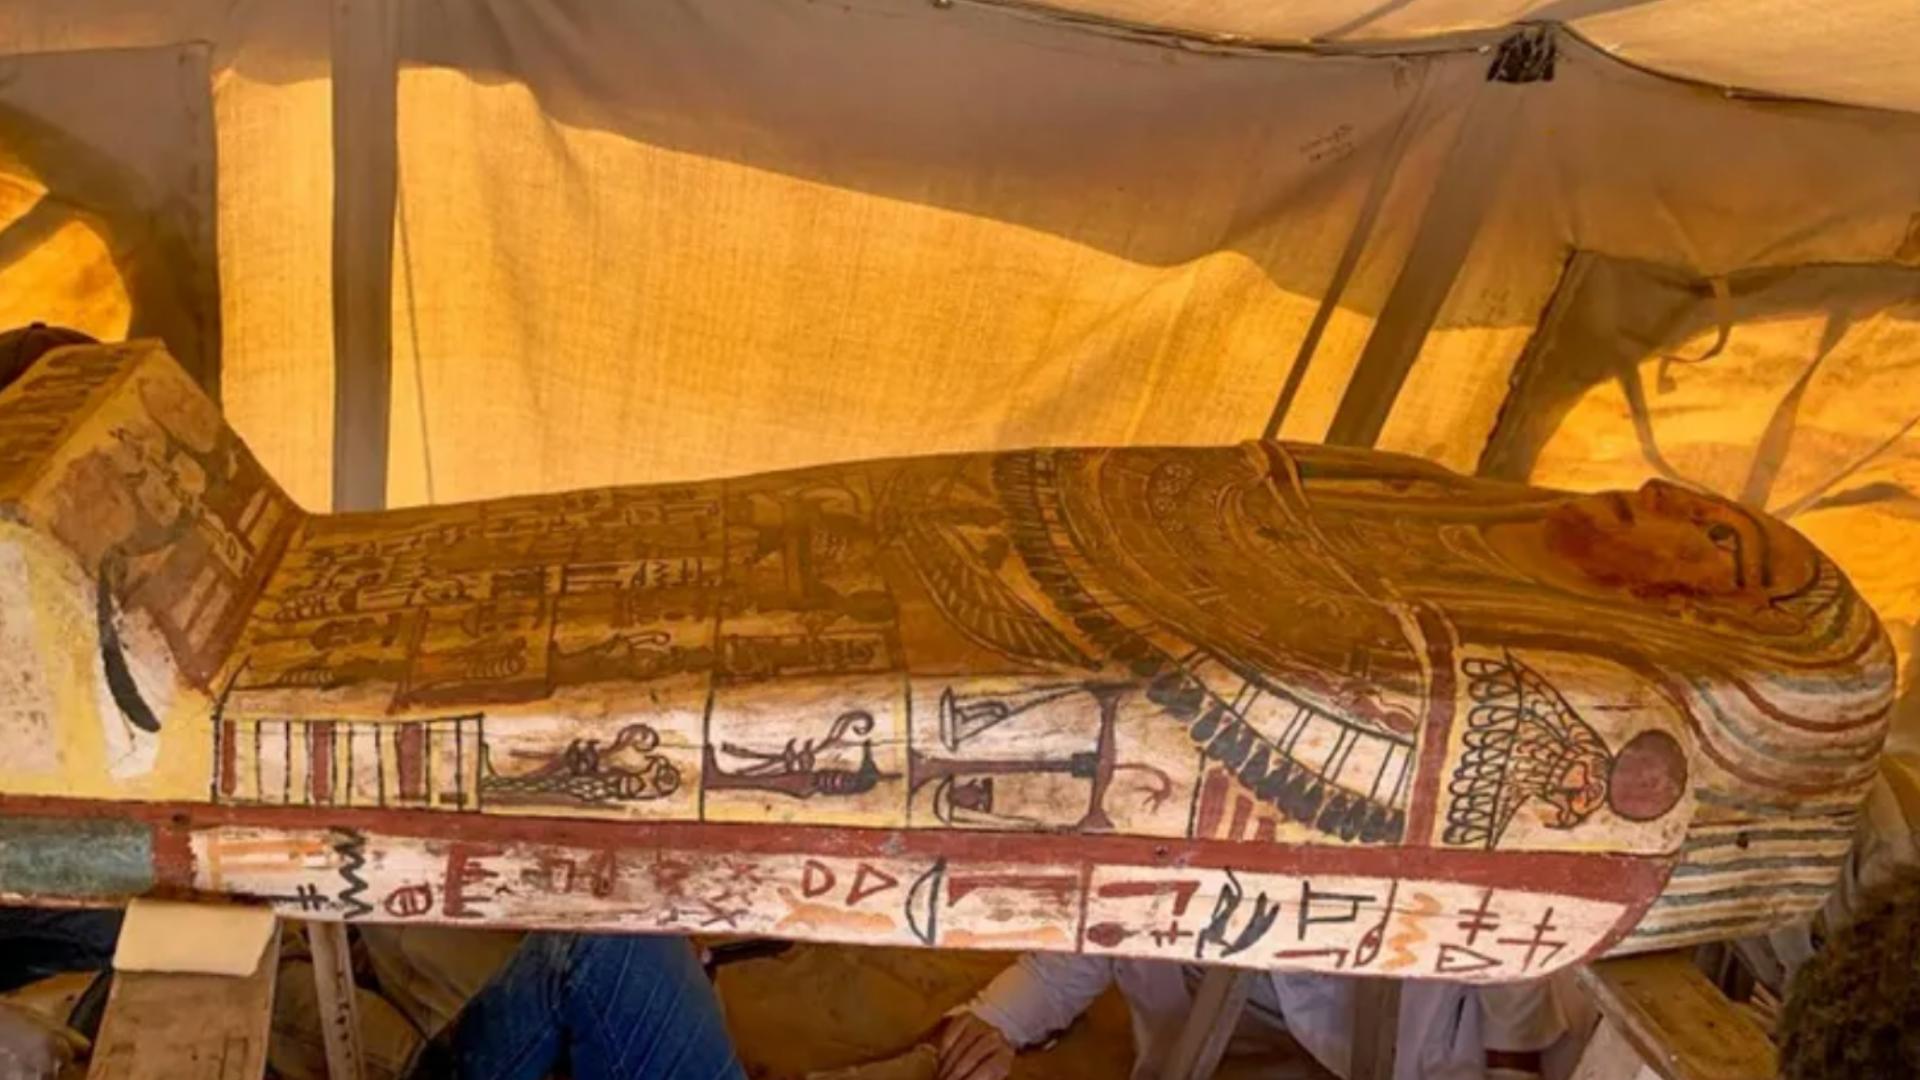 Descubren 27 sarcófagos enterrados en Egipto de 2,500 años